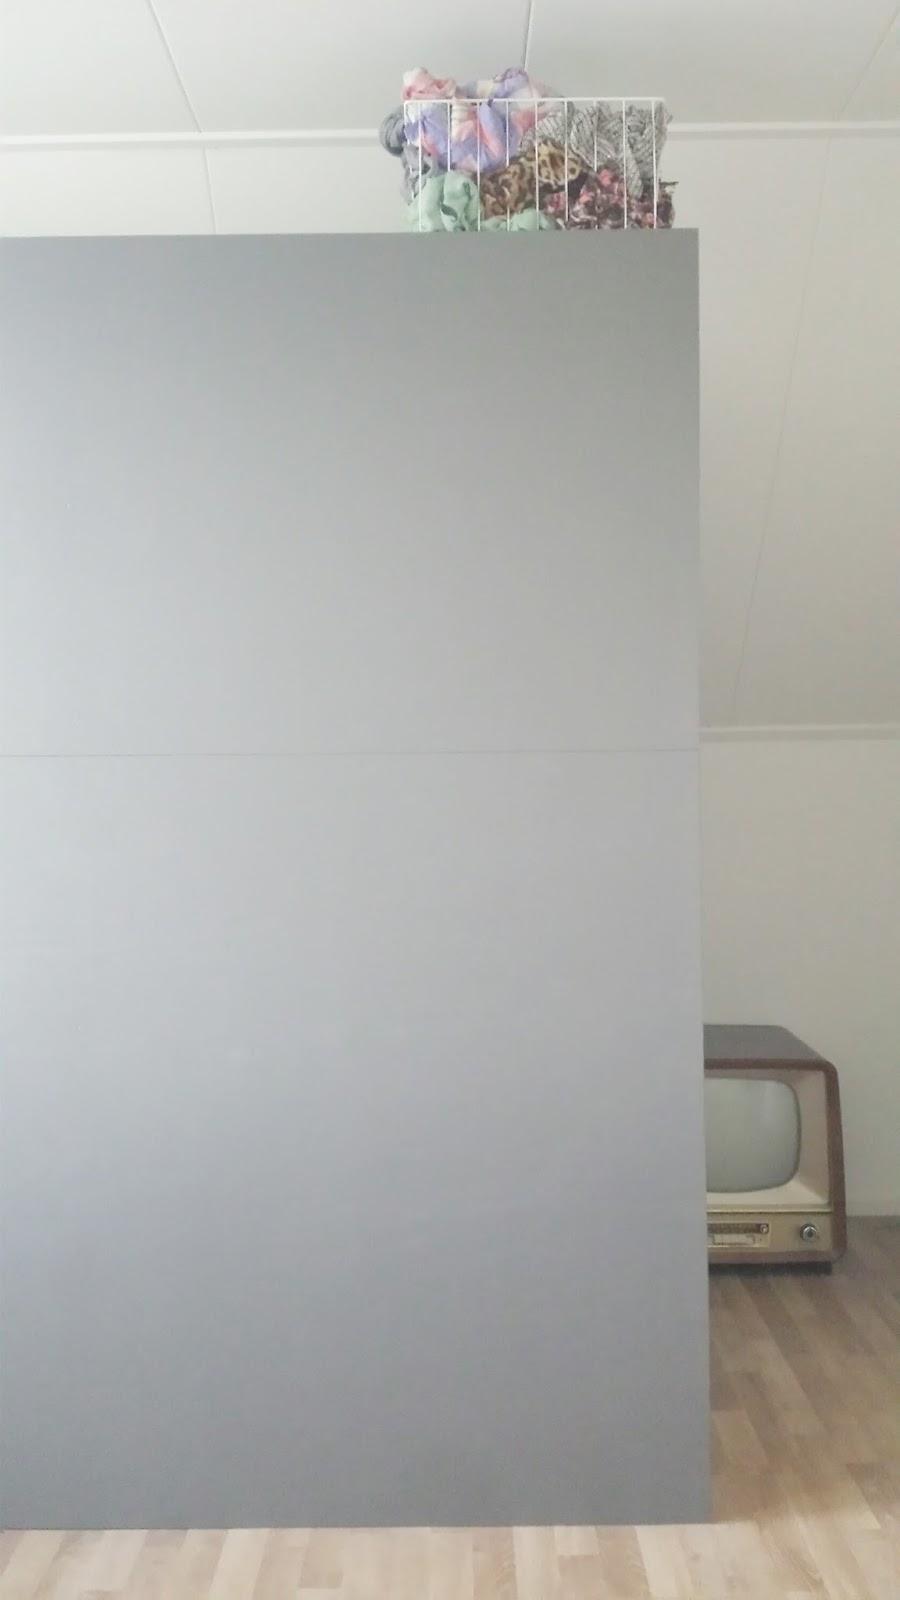 kast pax ikea best lage kast pax google zoeken with kast pax ikea gallery of ikea pax kast l. Black Bedroom Furniture Sets. Home Design Ideas